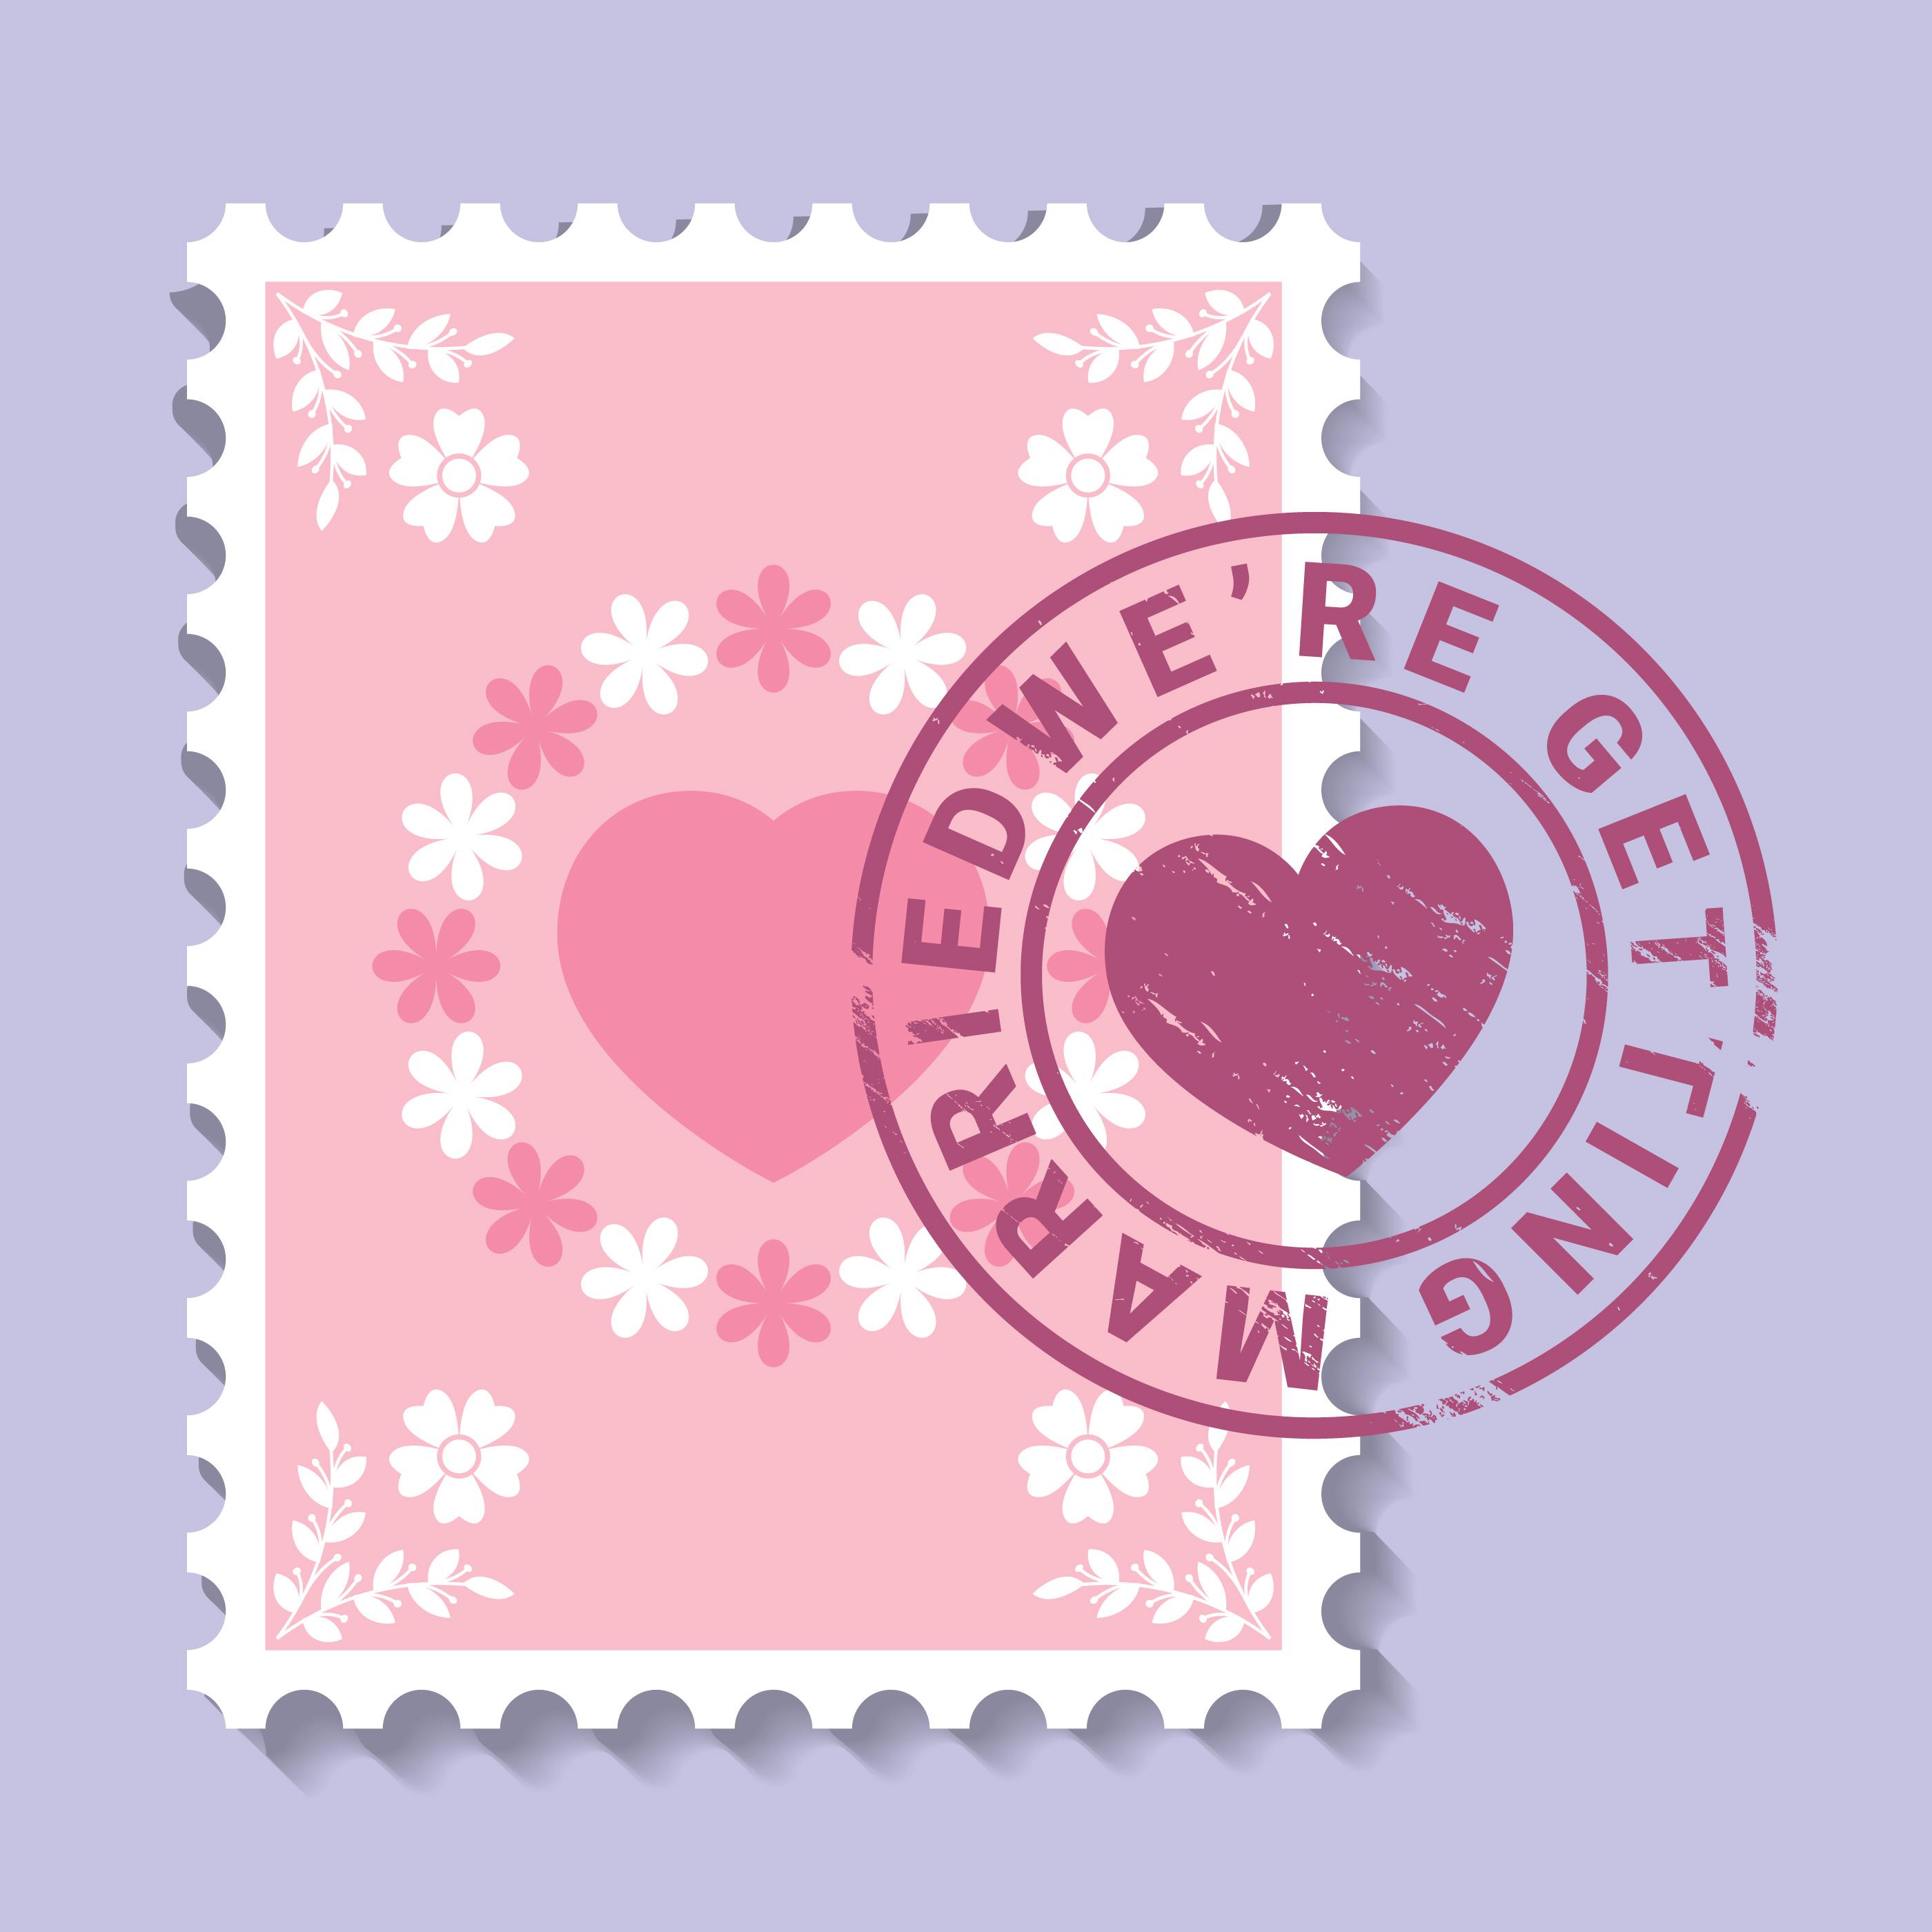 Stamp Wedding Invitation - Download Free Vector Art, Stock Graphics ...